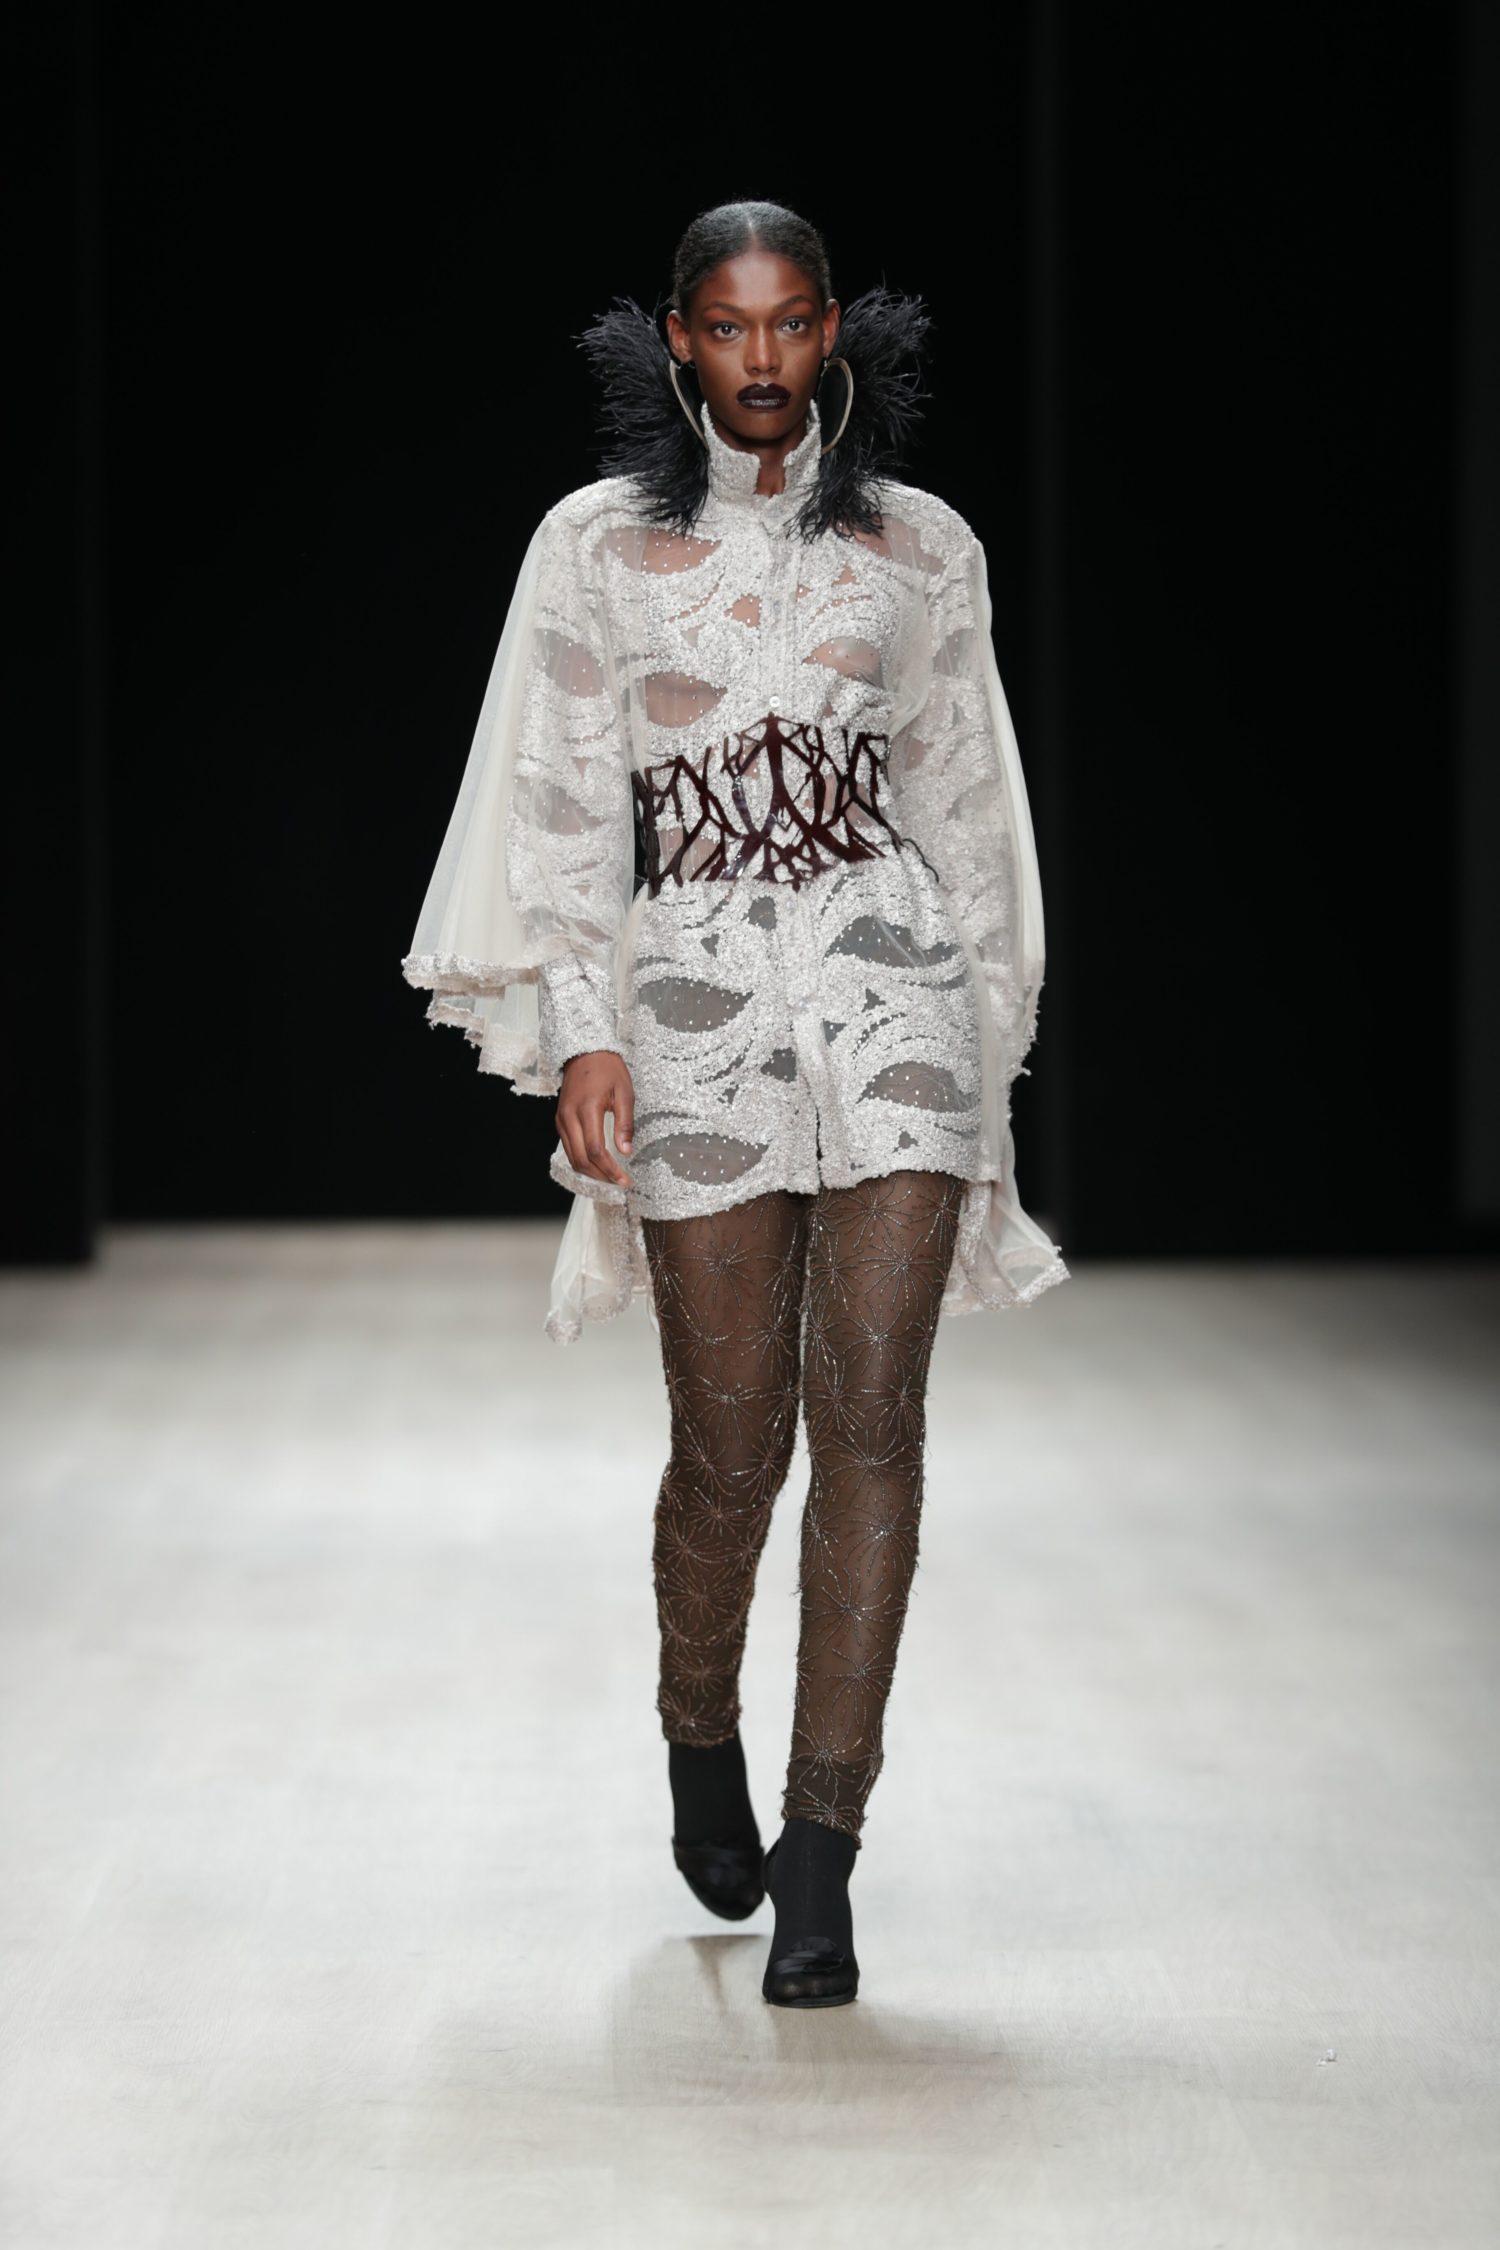 ARISE Fashion Week 2019 | David Tlale